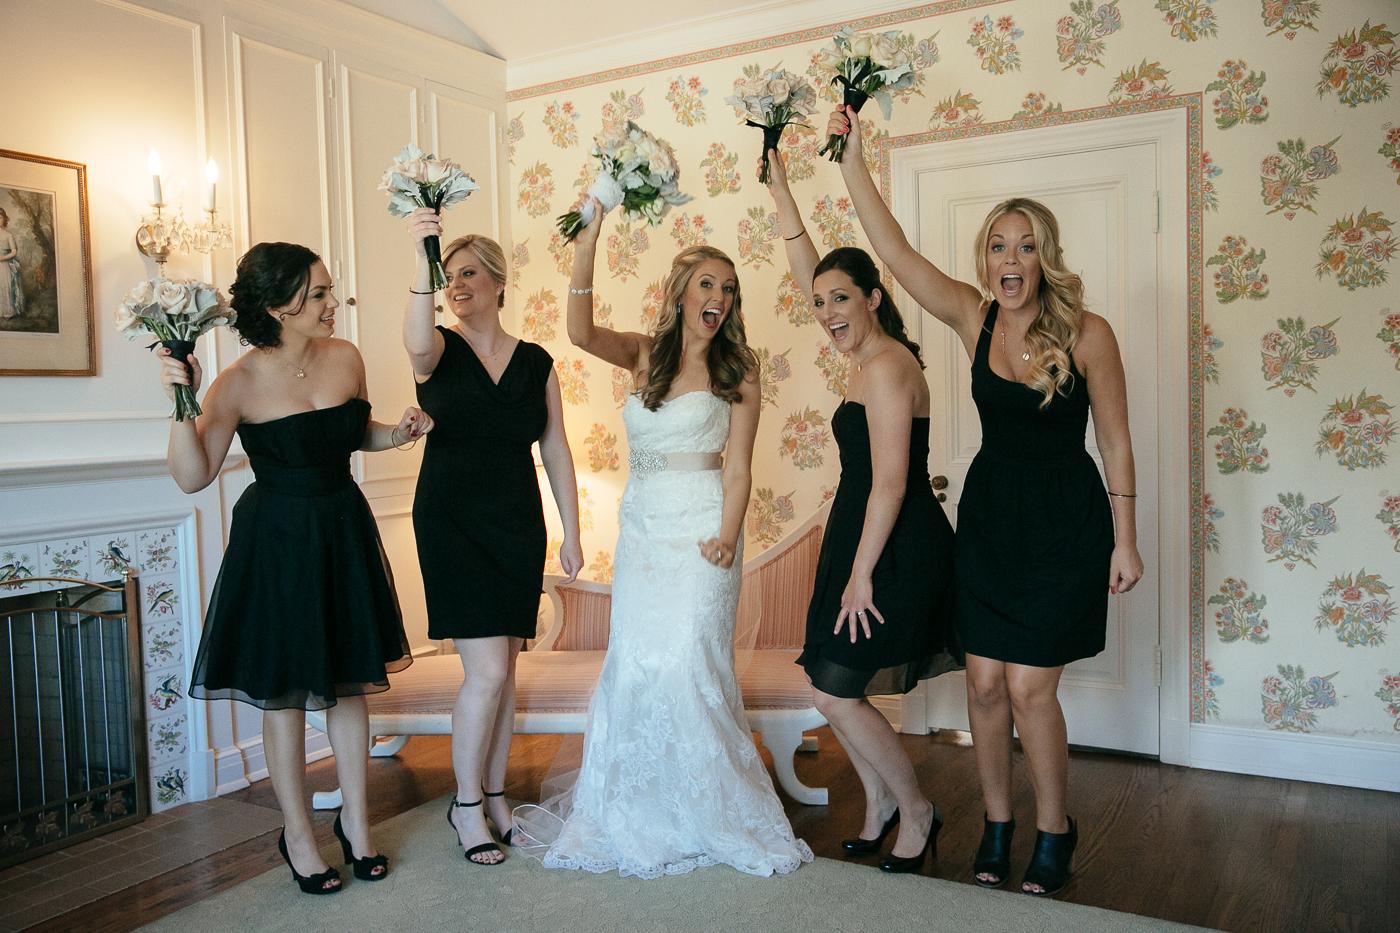 RYAN_&_KELLEY_DARLINGTON_HOUSE_WEDDING_2014_7X9A1880.JPG